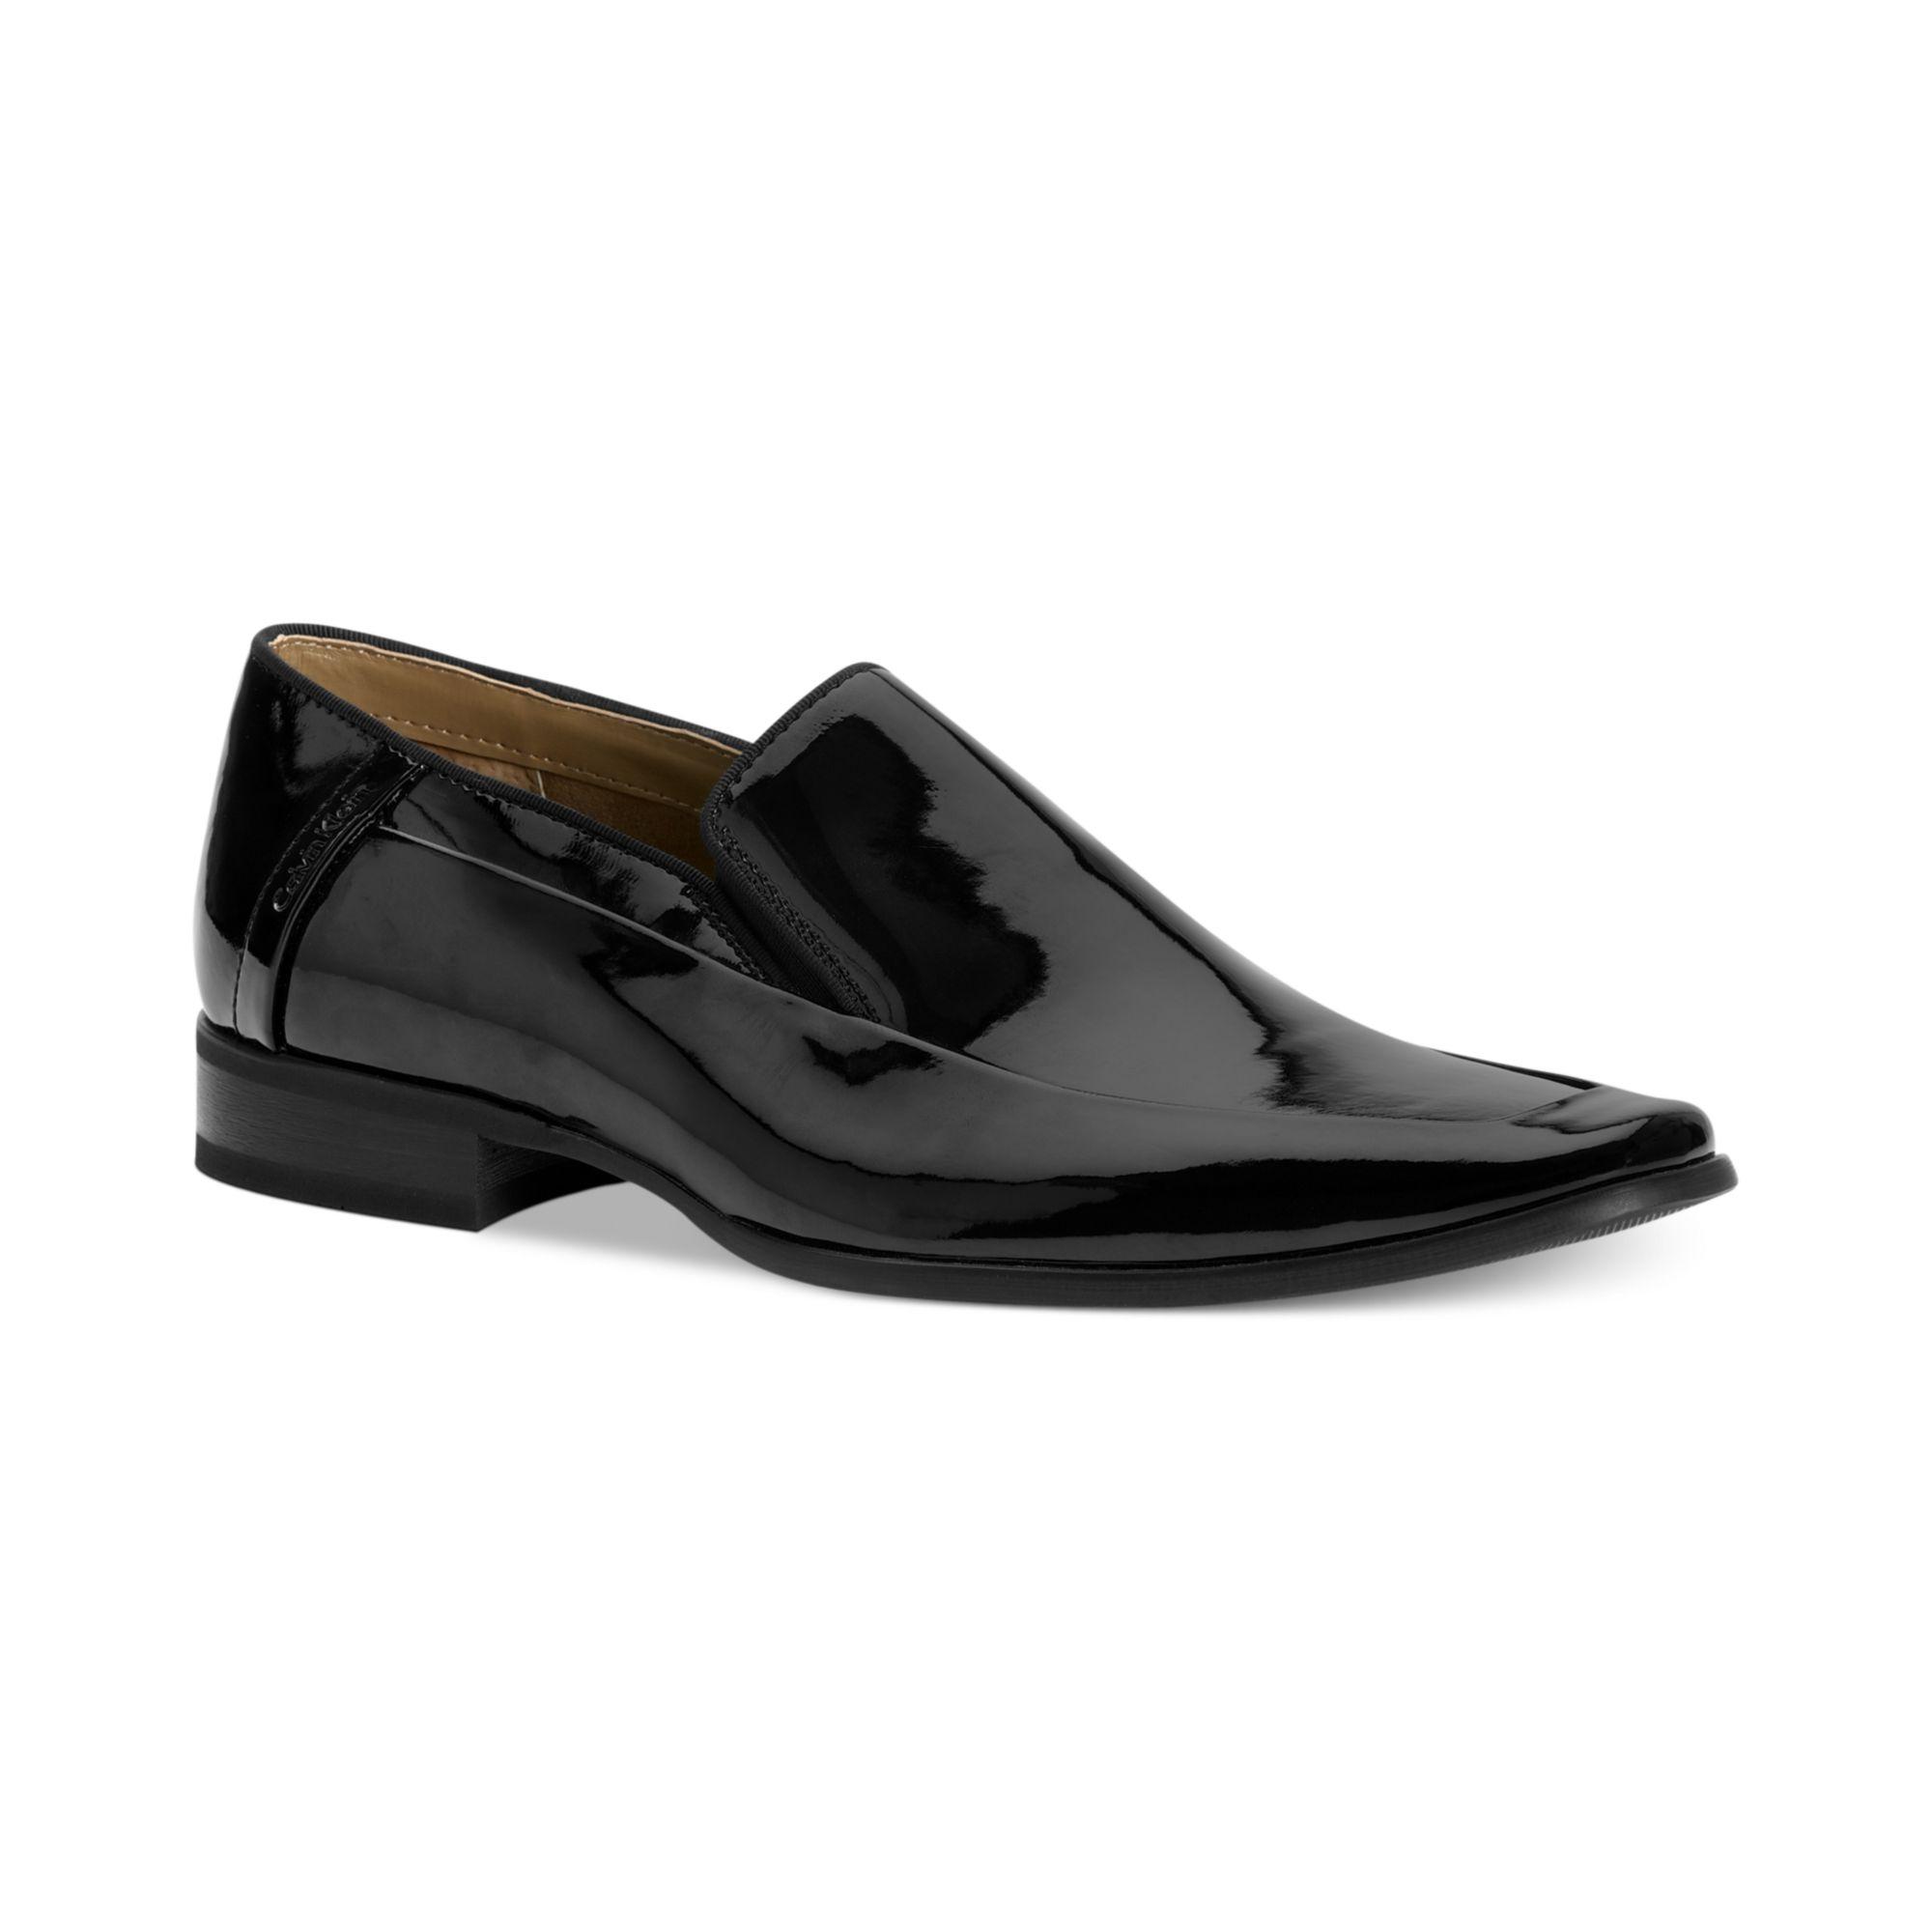 calvin klein brad patent moc toe slip on shoes in black. Black Bedroom Furniture Sets. Home Design Ideas